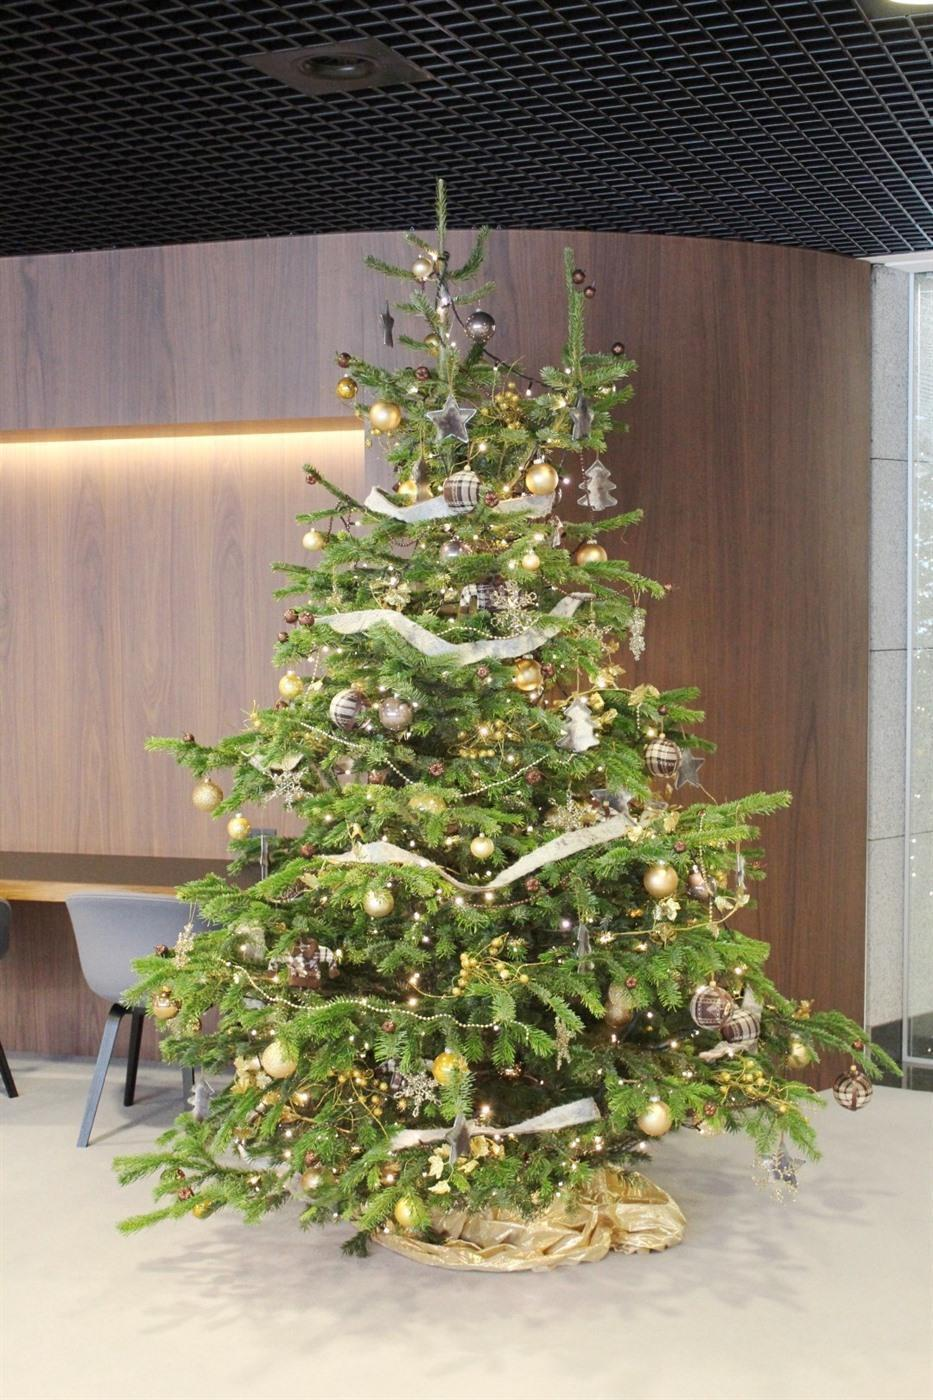 Rent a Christmas tree